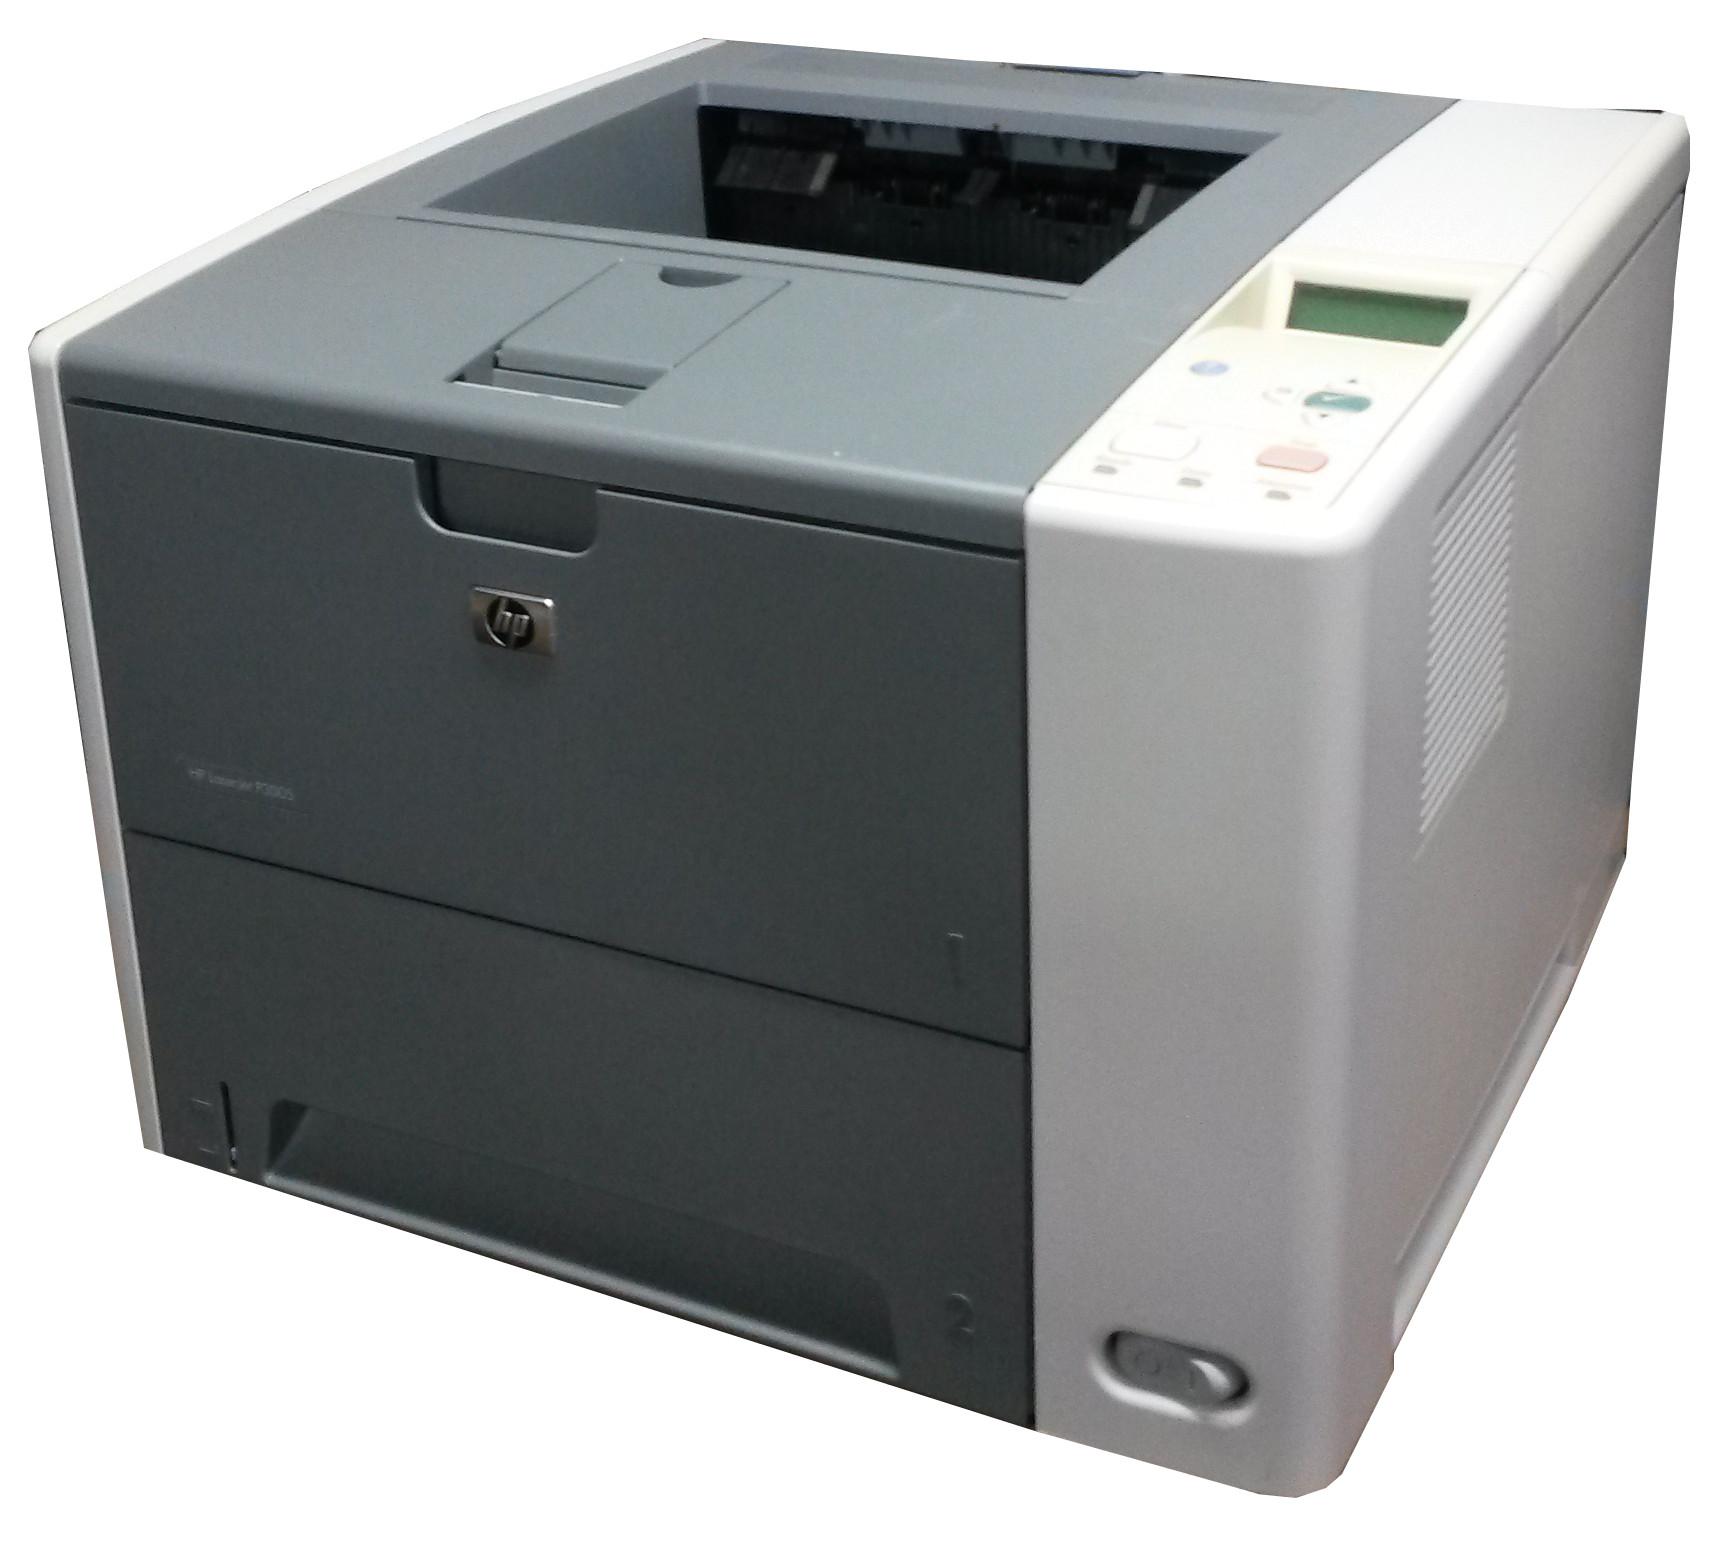 Hp- 3005 printer